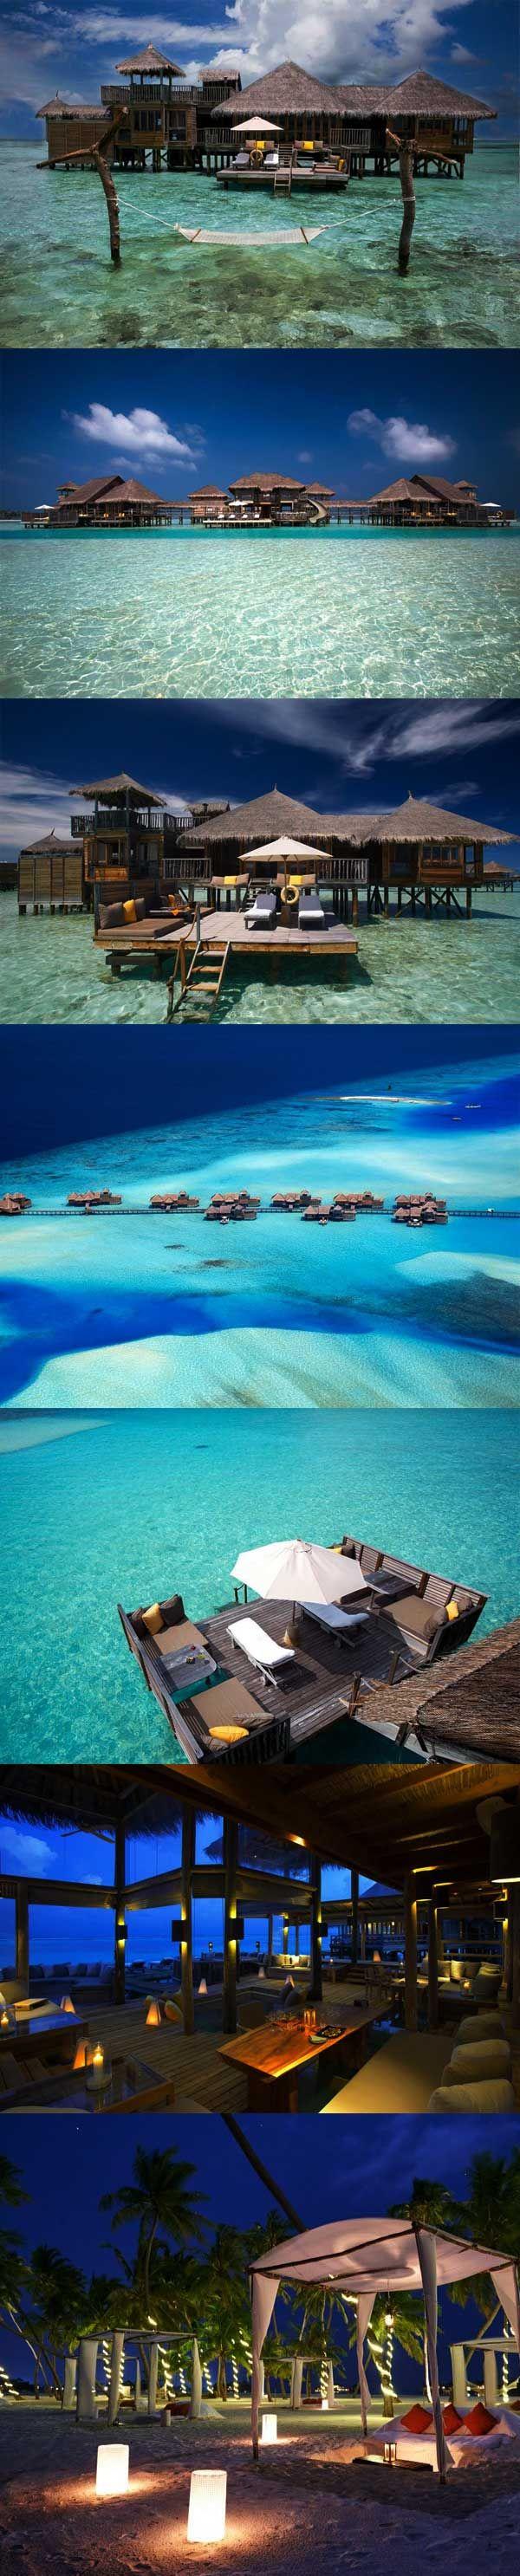 Best Best Hotels In Maldives Ideas On Pinterest Best - Island resort maldives definition paradise